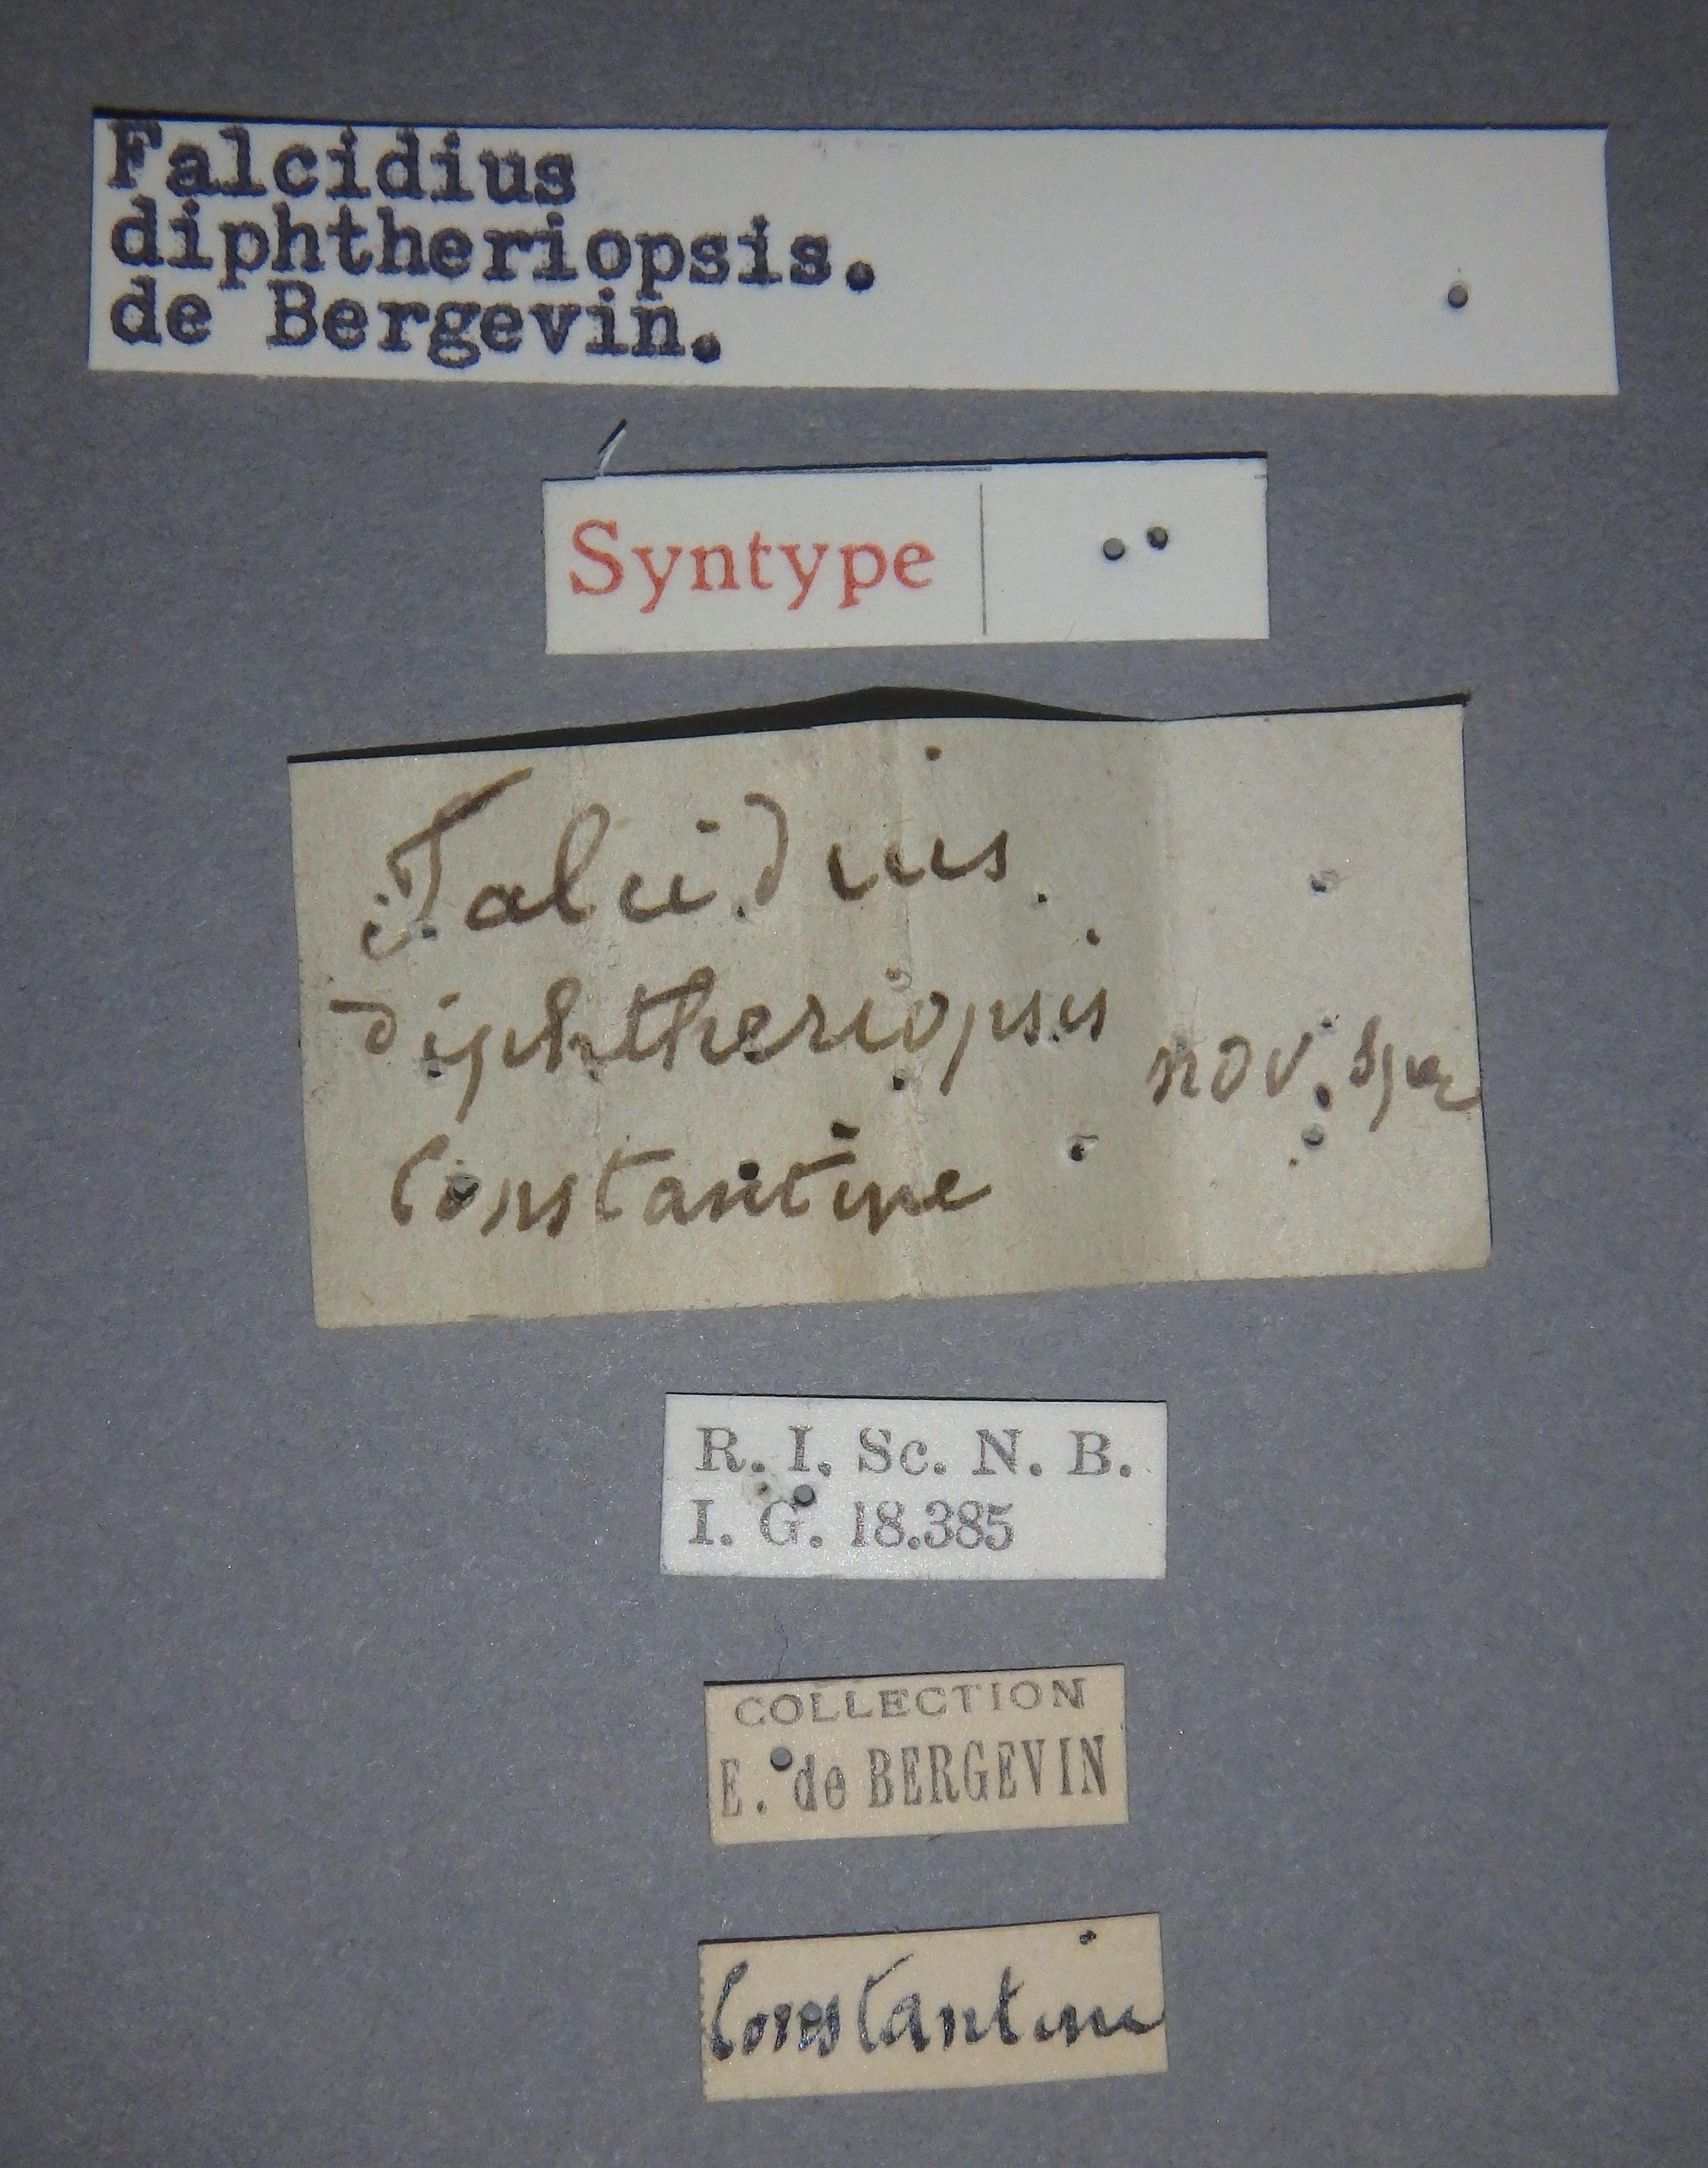 Falcidius diphtheriopsis st1 Lb.JPG